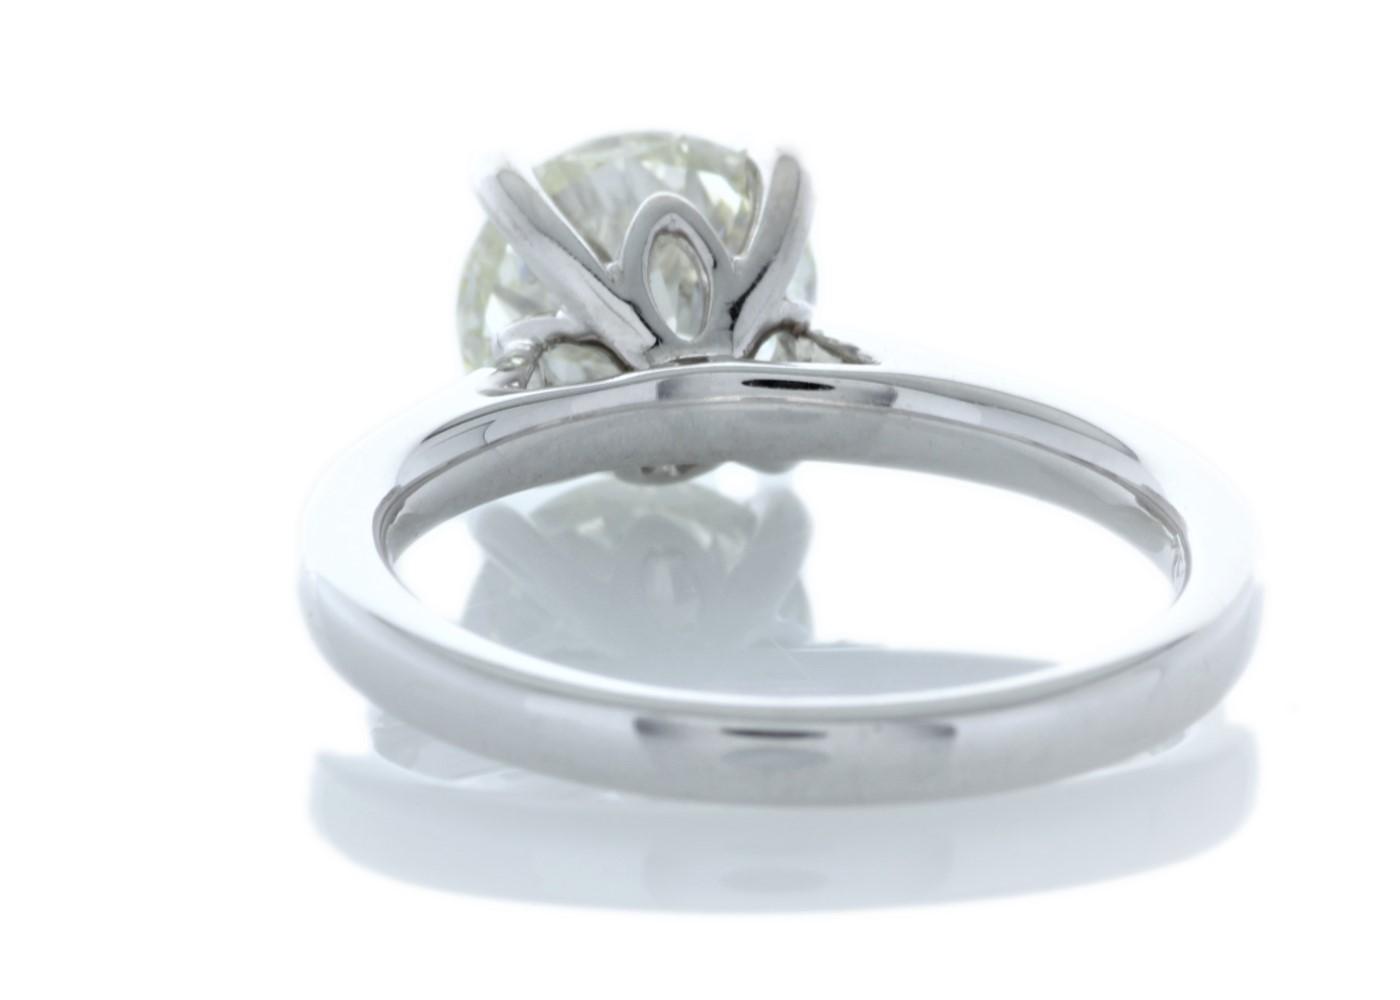 Lot 10 - 18ct White Gold Single Stone Claw Set Diamond Ring 2.05 Carats